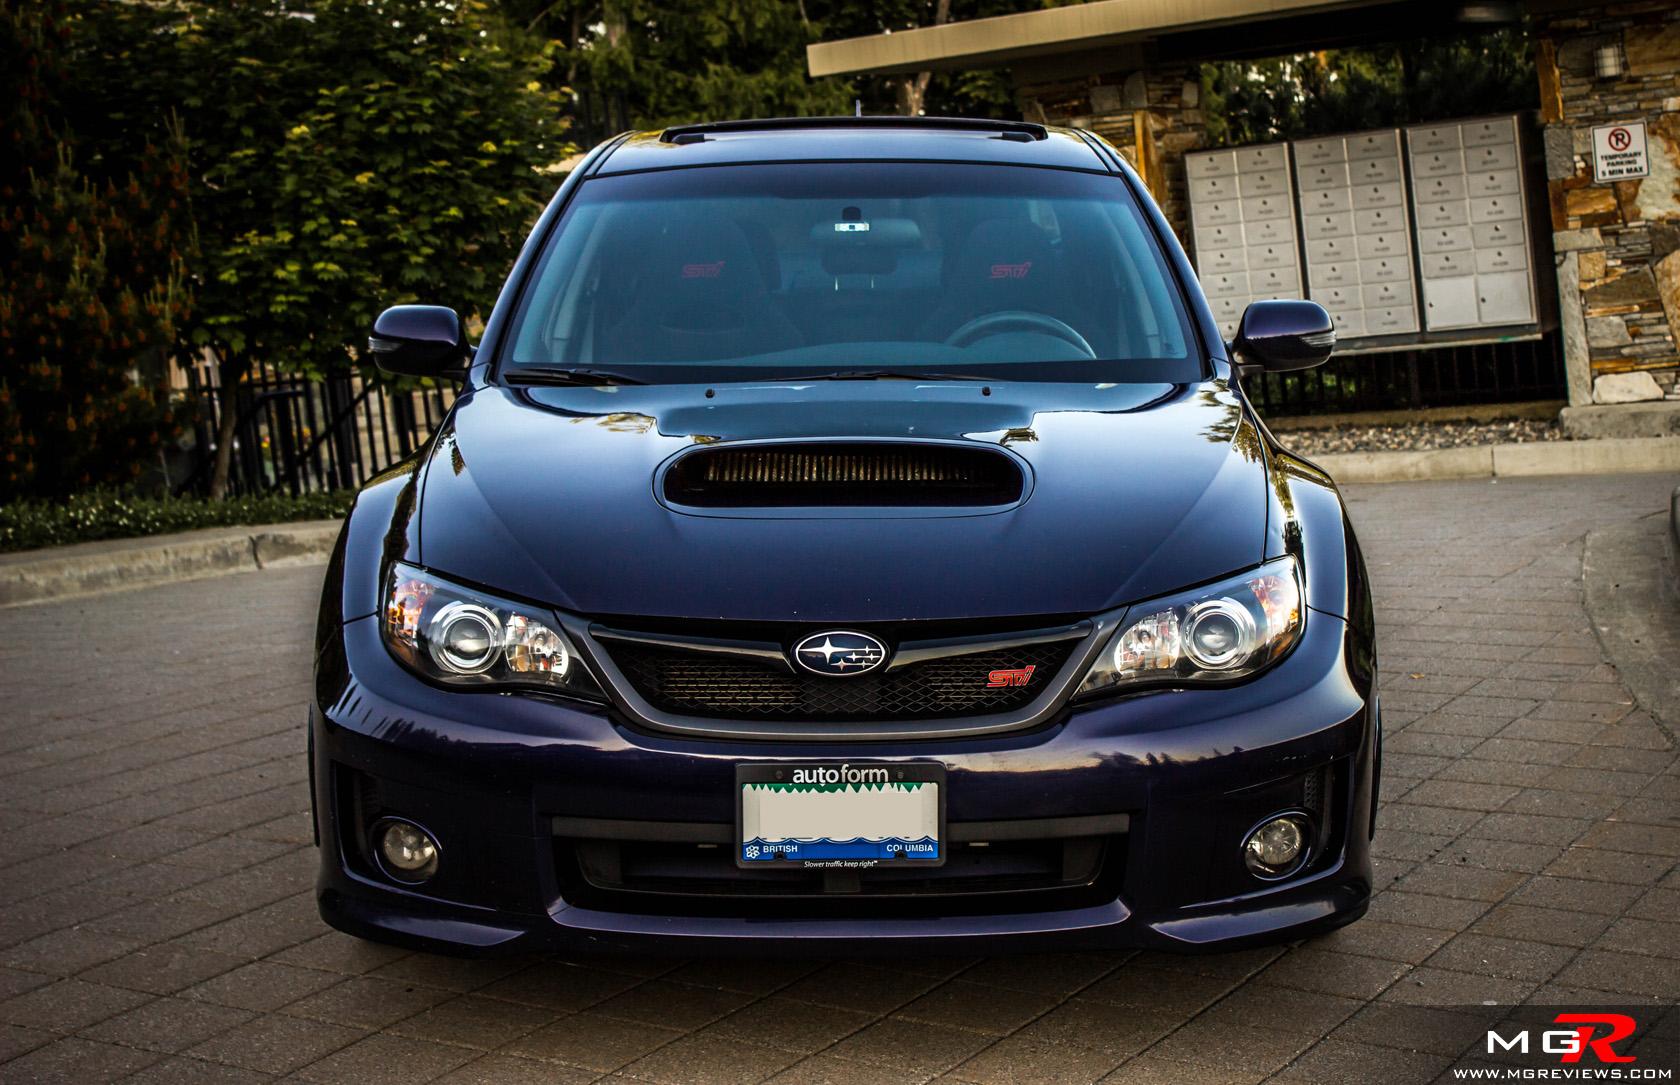 Review 2012 Subaru Impreza Wrx Sti M G Reviews